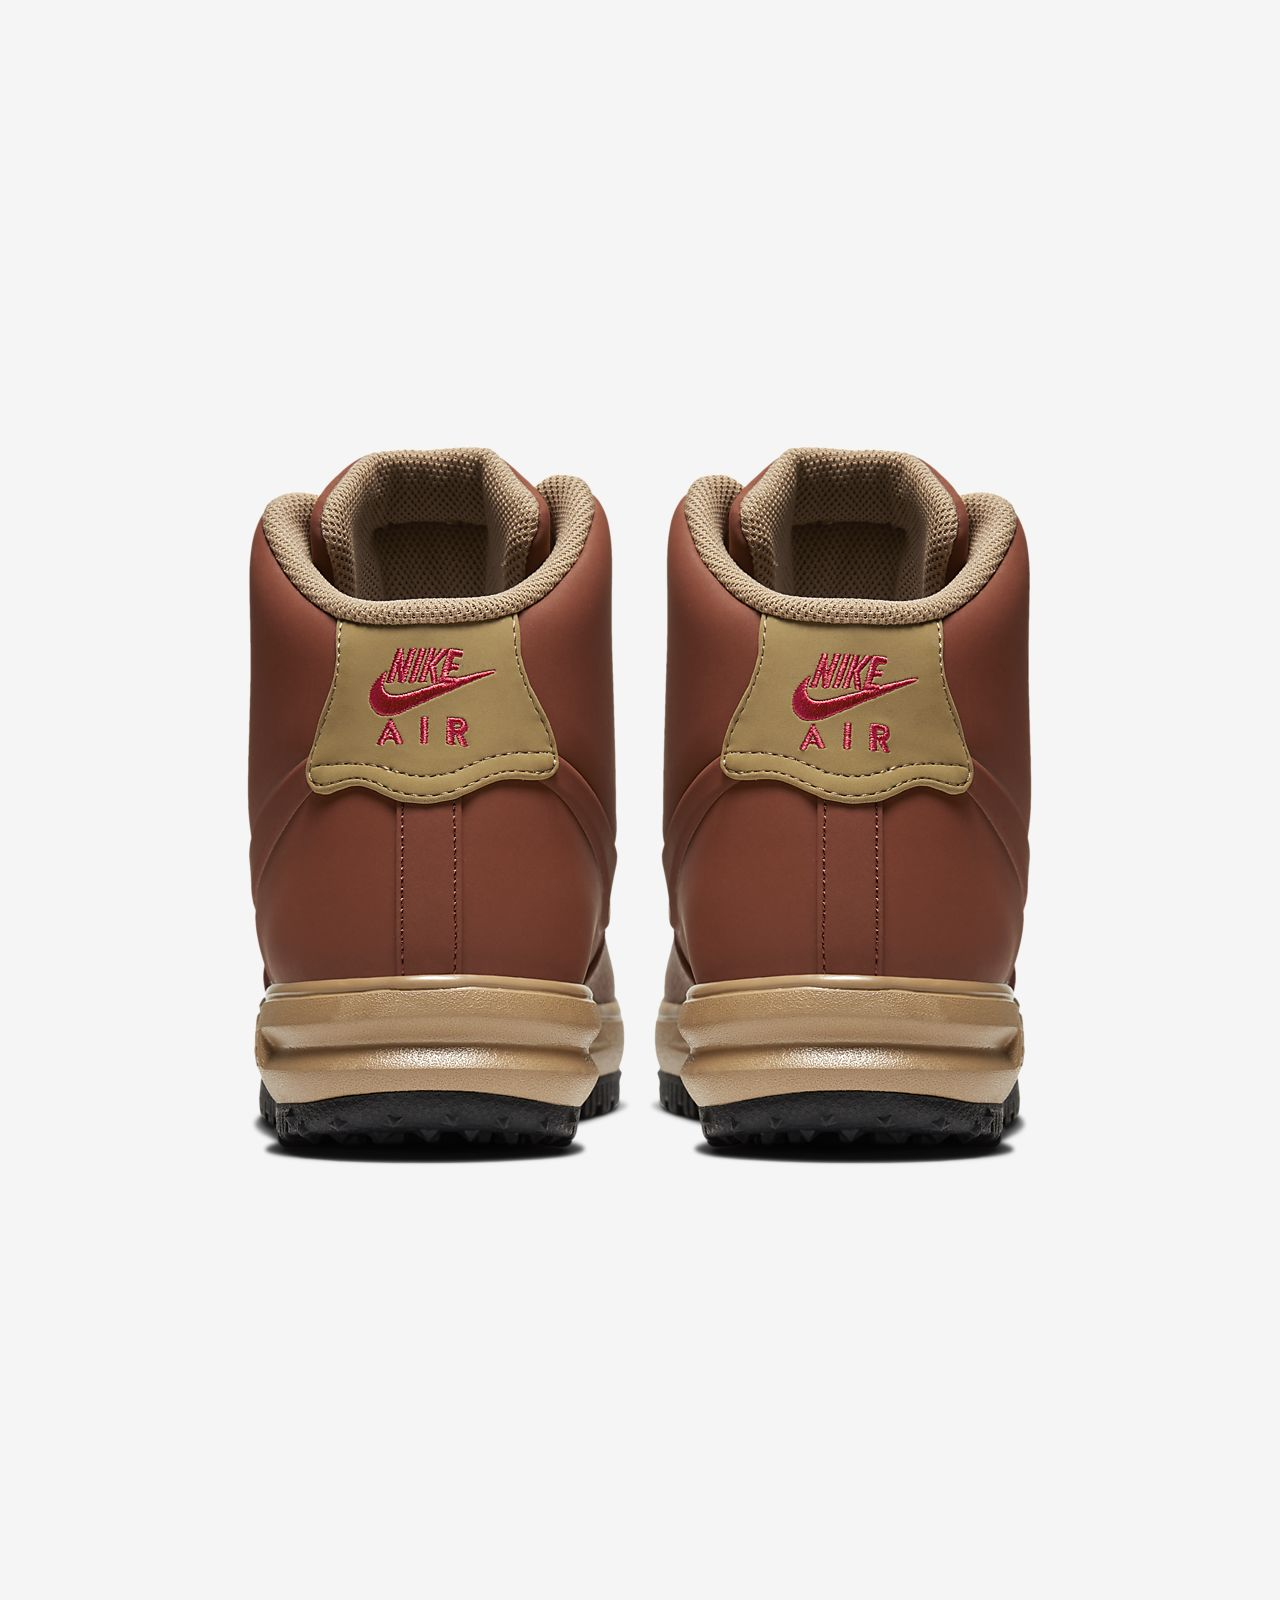 Nike Lunar Force 1 /'18 Duckboot Mens Brown Lifestyle Sneakers Shoes BQ7930-200